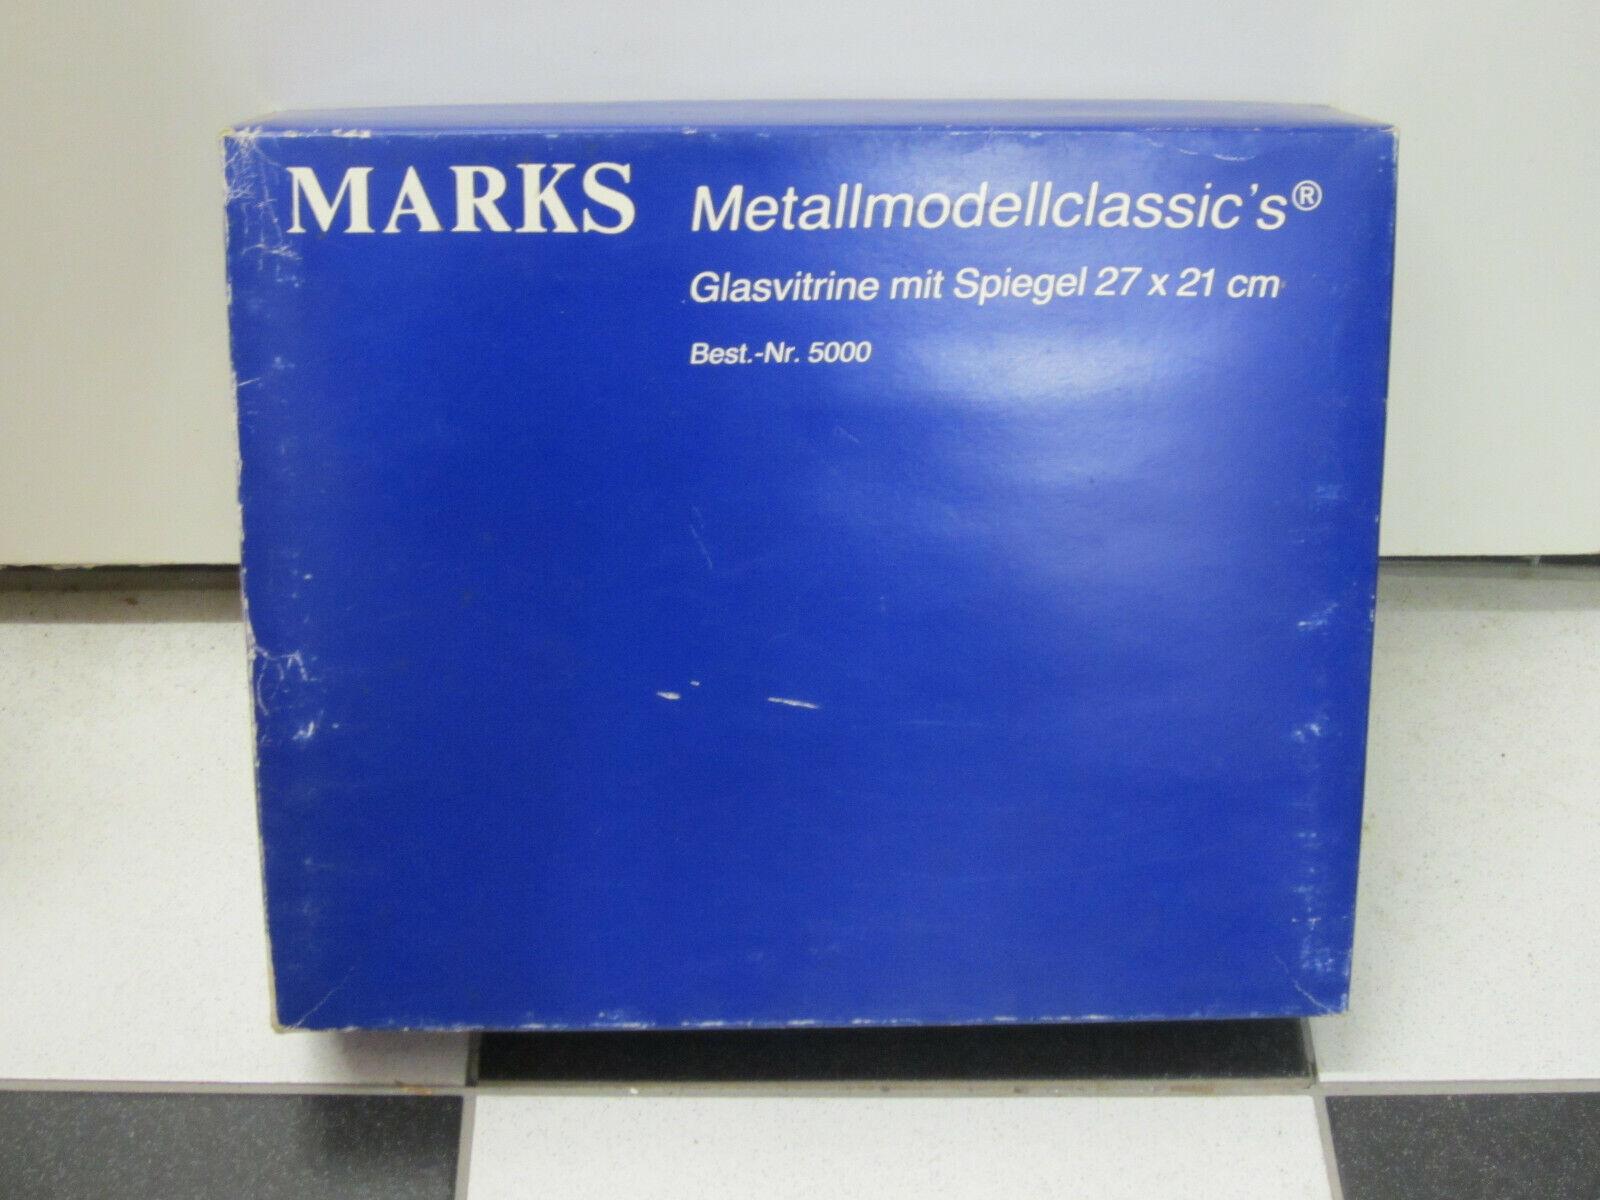 Porcelaine vitrine avec miroir,  28 x 19 cm, Marks metallmodelclassic's  prix de gros